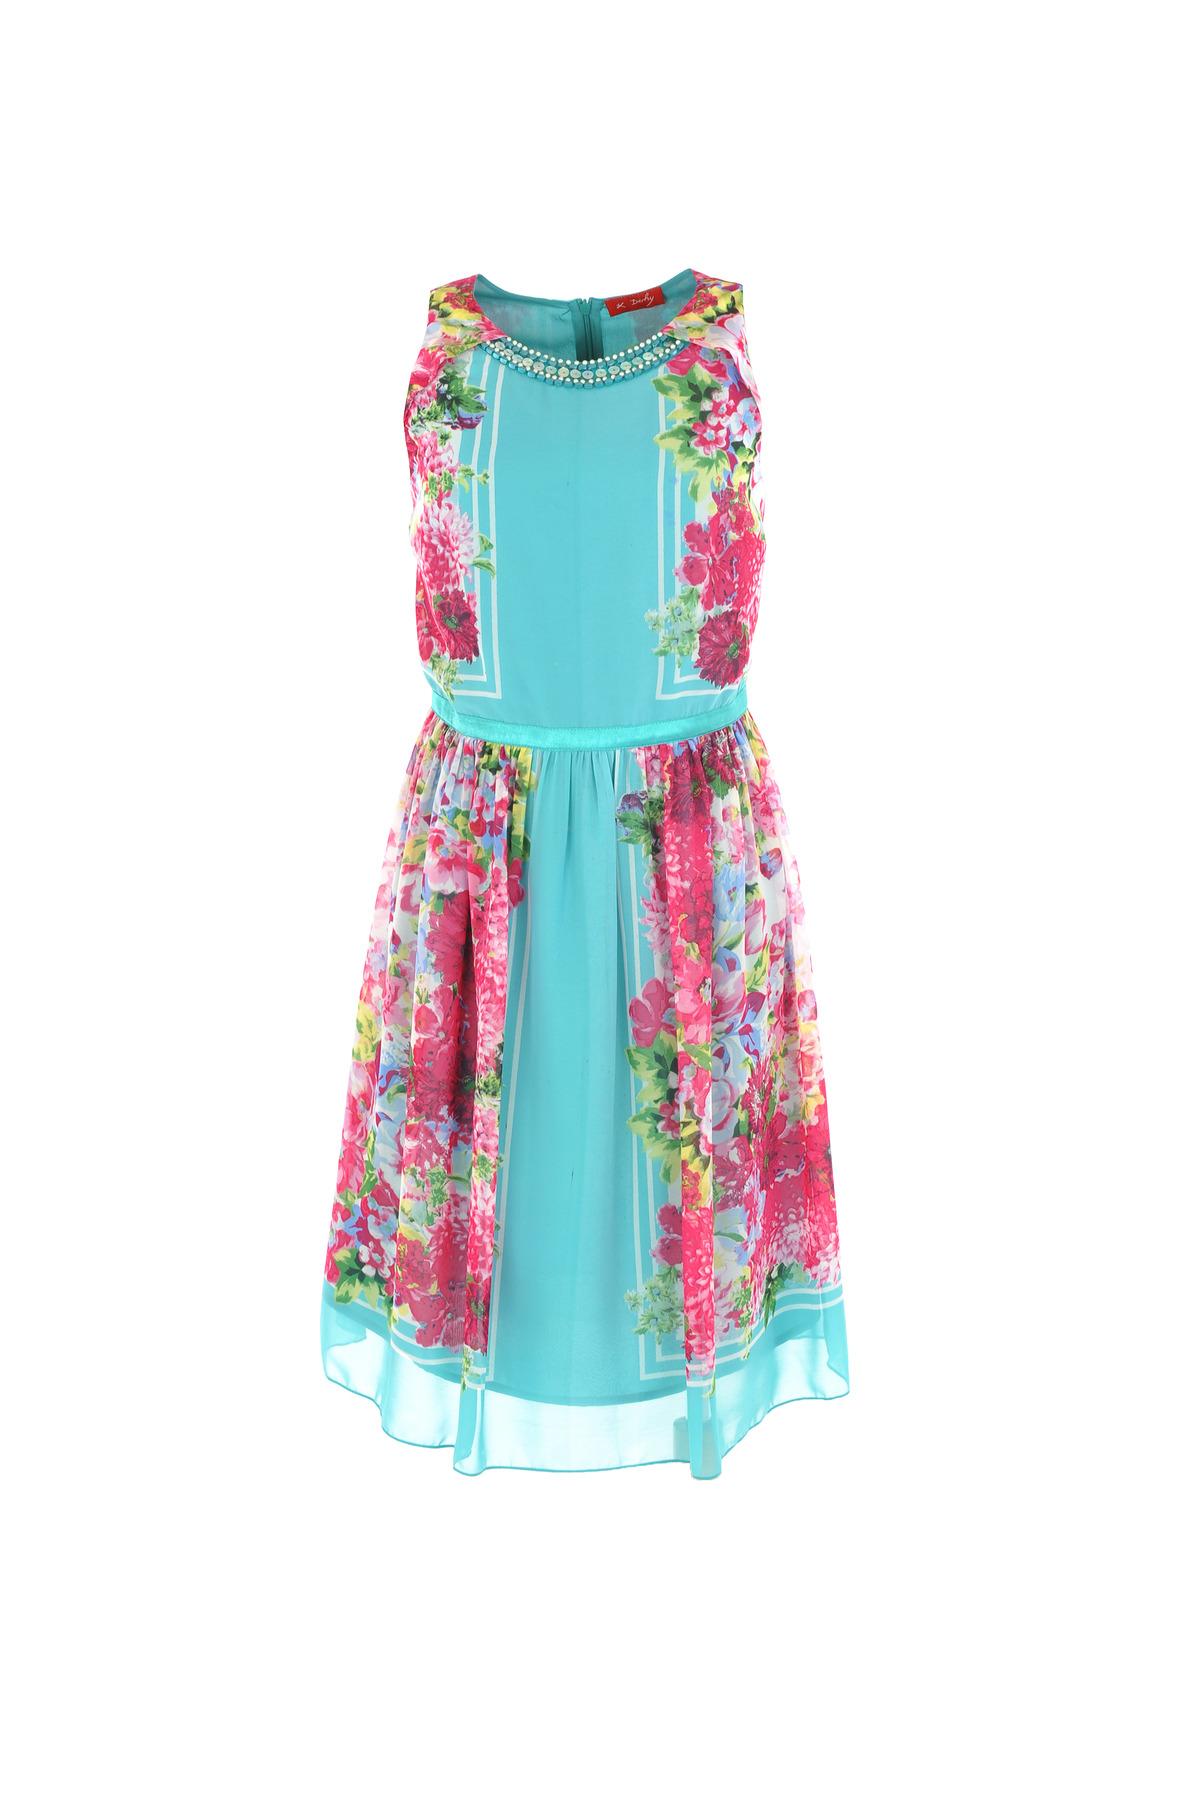 robe alcane robe alcane 68 prix ttc reference s310344 matiere 100 % ...